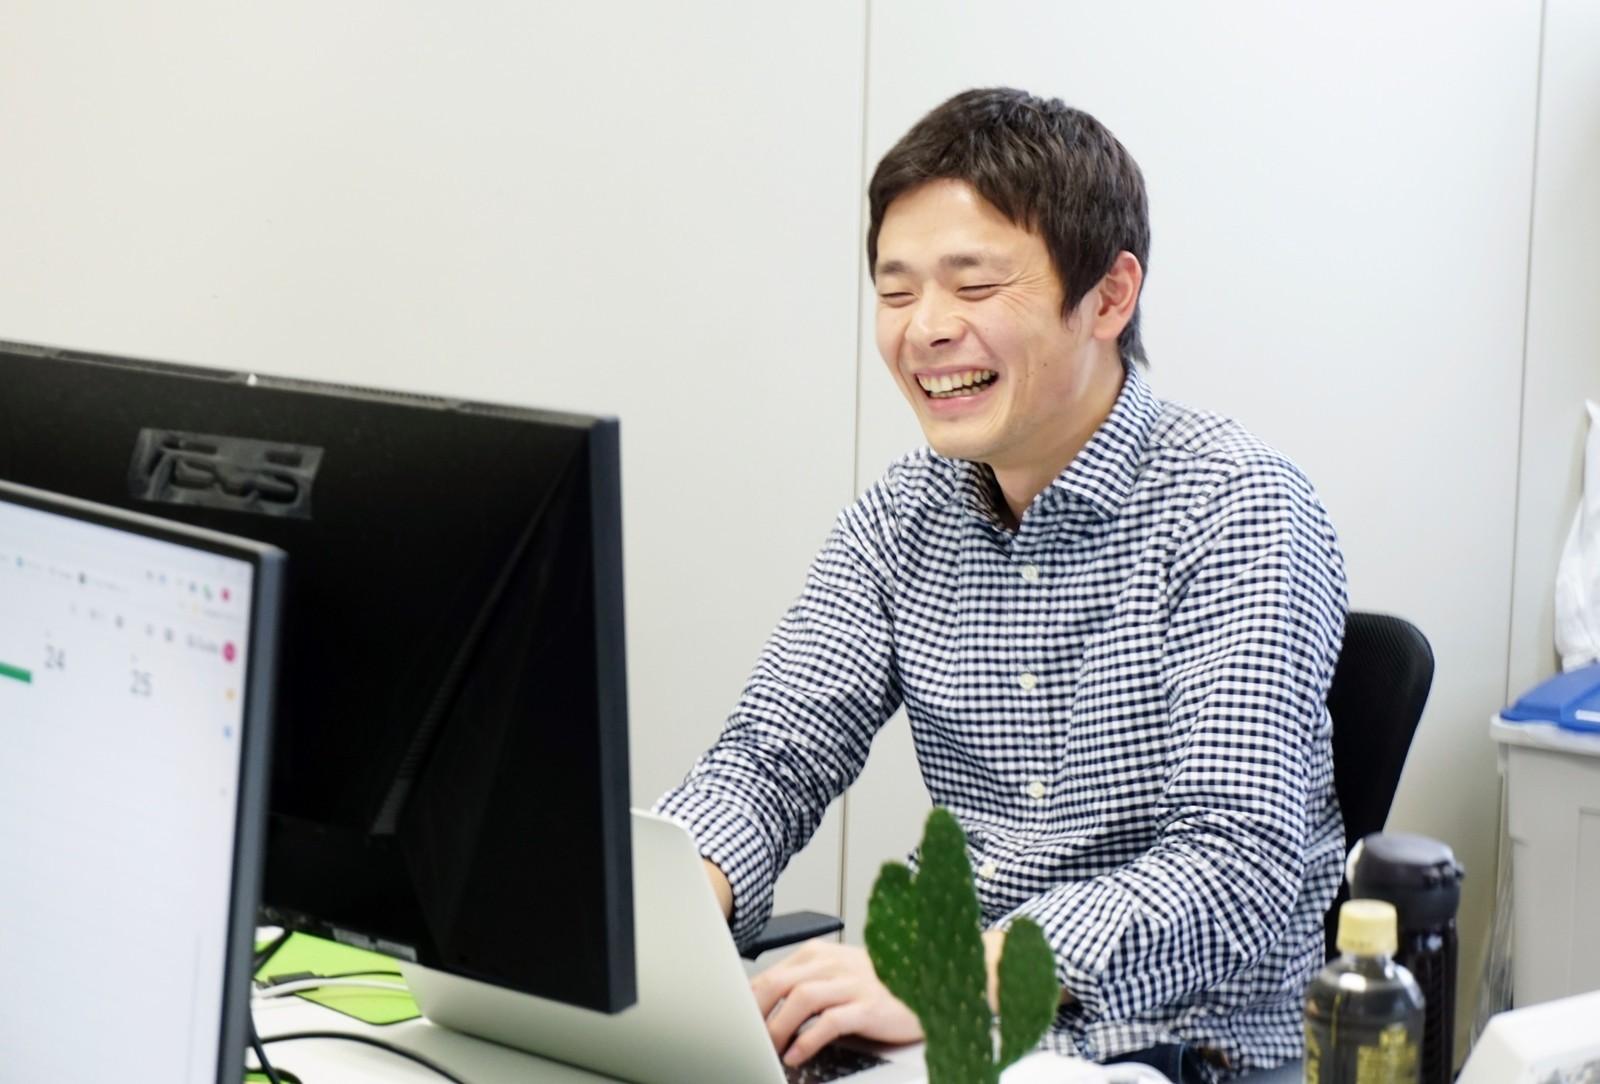 "【Reactでフロントエンド開発】""在庫"" דAI"" で不良在庫を削減、環境保全に取り組むSaaSベンチャー! ※東京・大阪勤務"